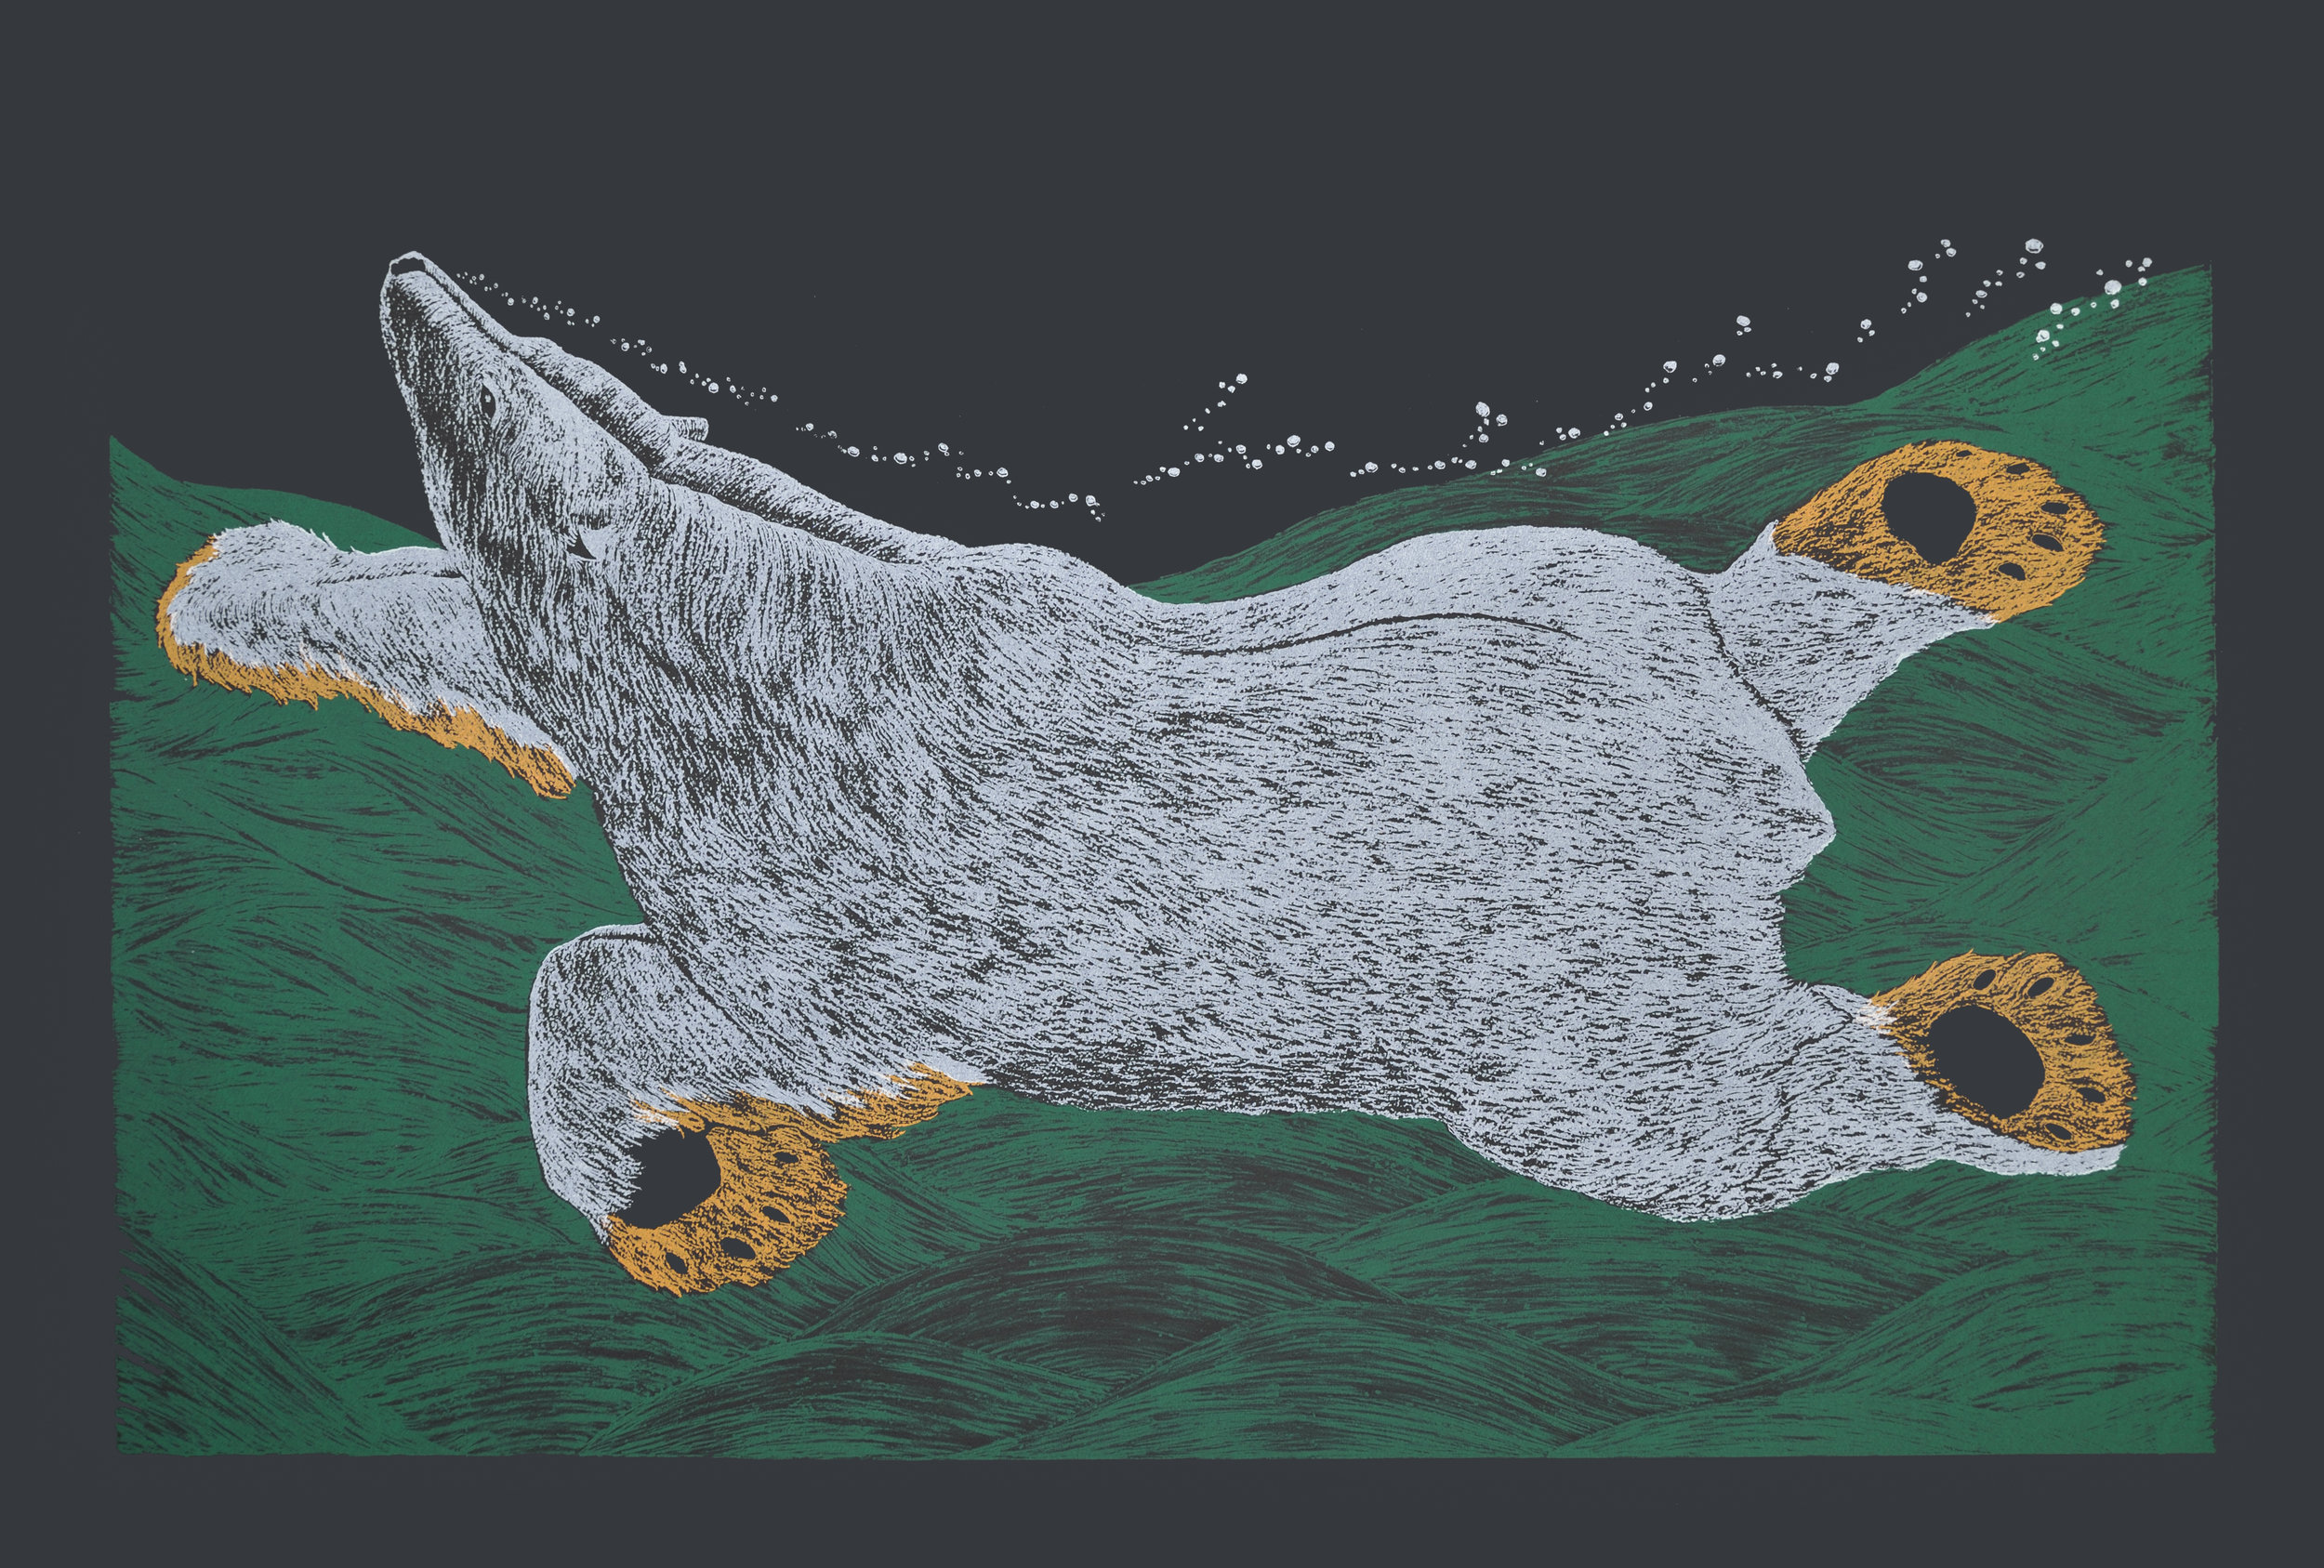 Tim Pitsiulak SWIMMING BEAR, 2016 Screenprint on Arches Cover Black Printer: Open Studio 76.5 x113 cm edition of 50